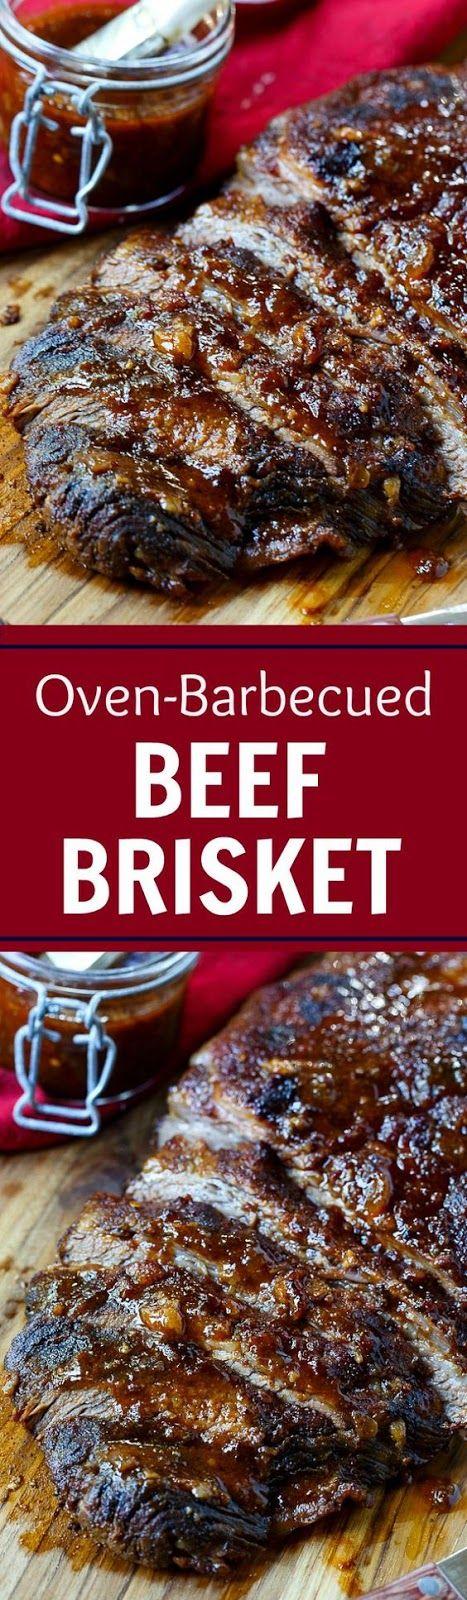 Oven - Barbecued Beef Brisket